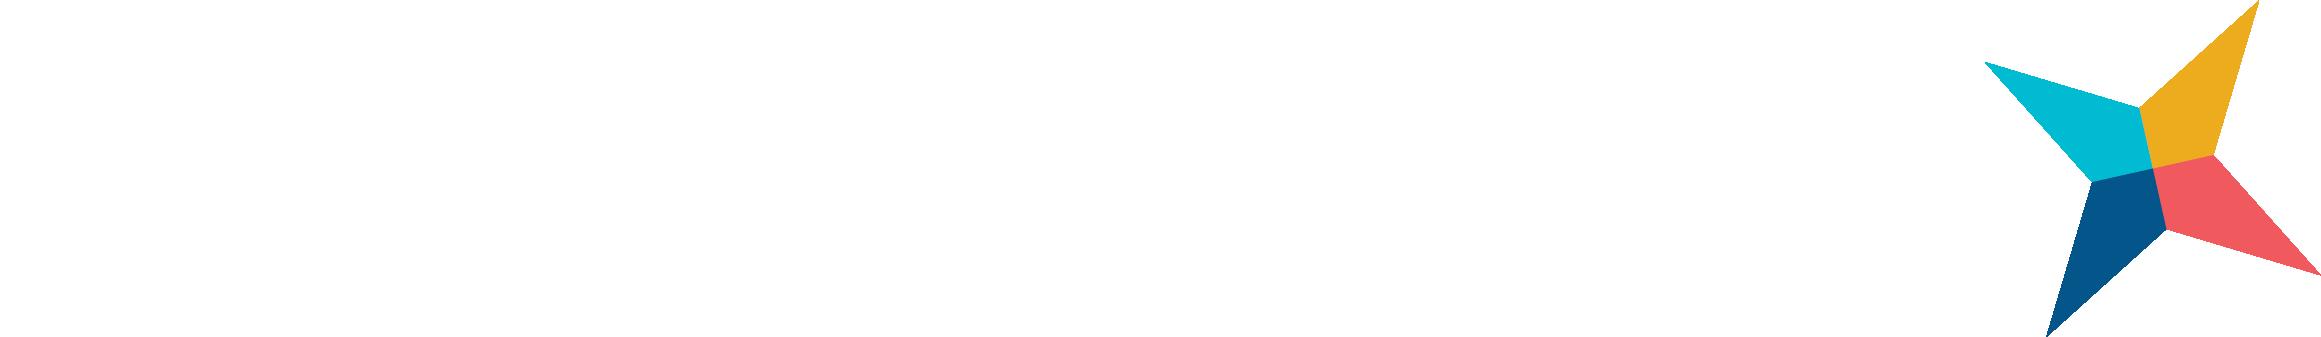 nf-logo-white-color